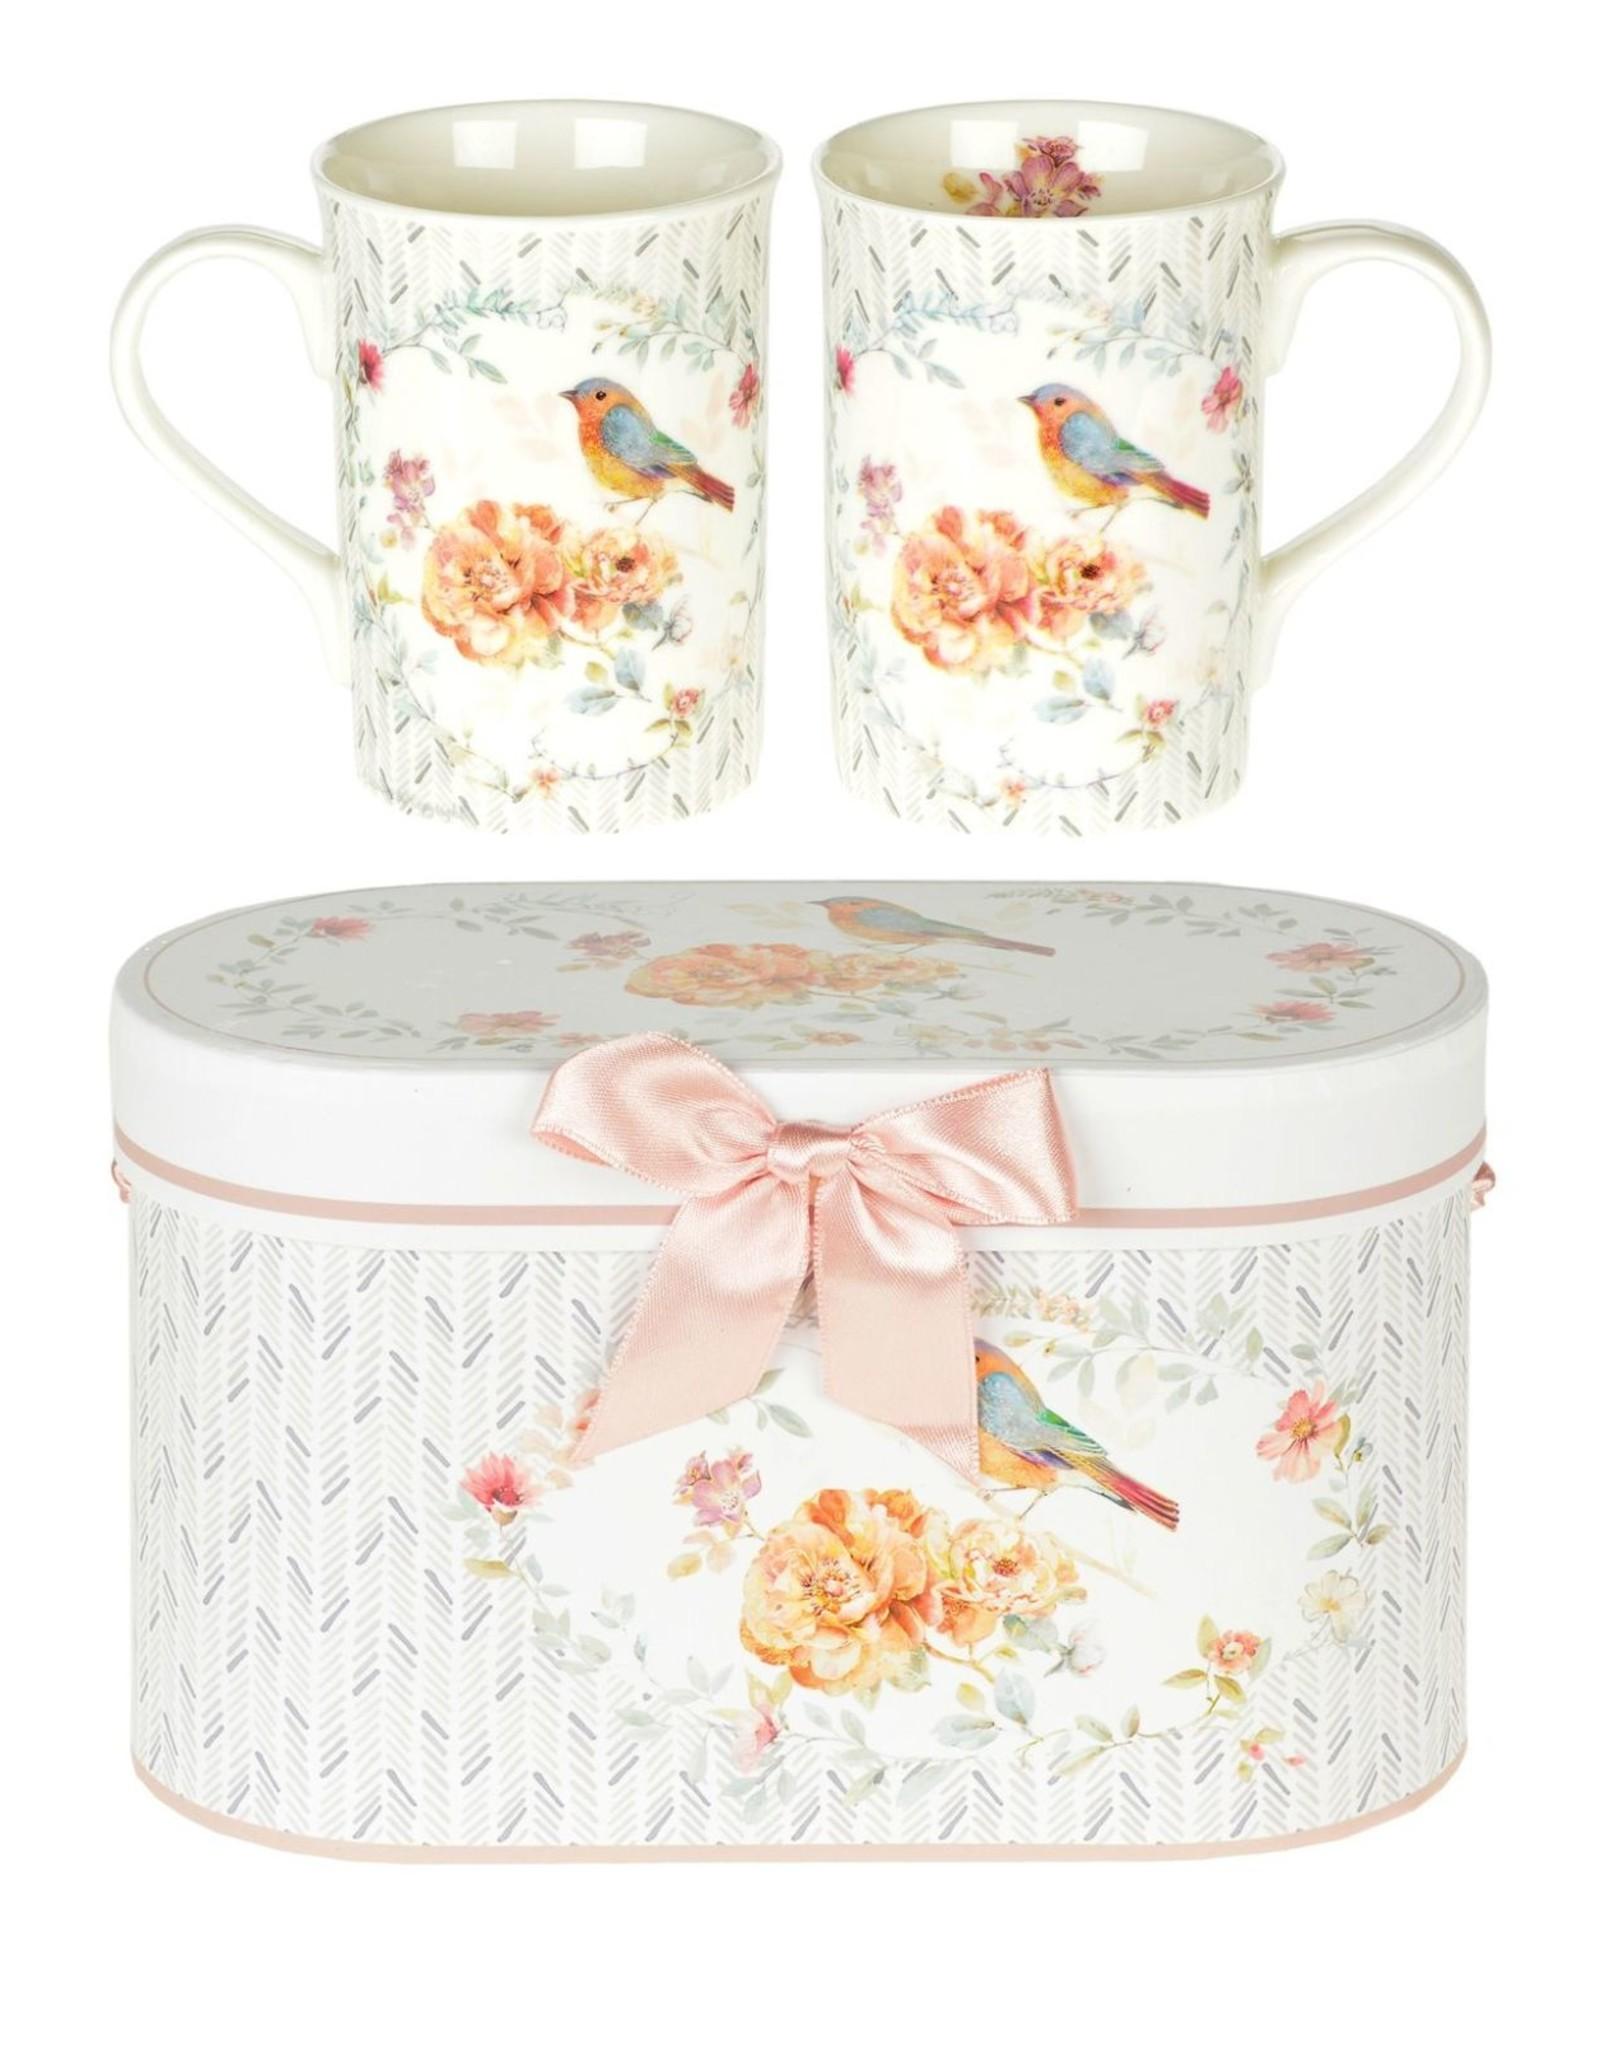 Bird China Mugs Set of 2